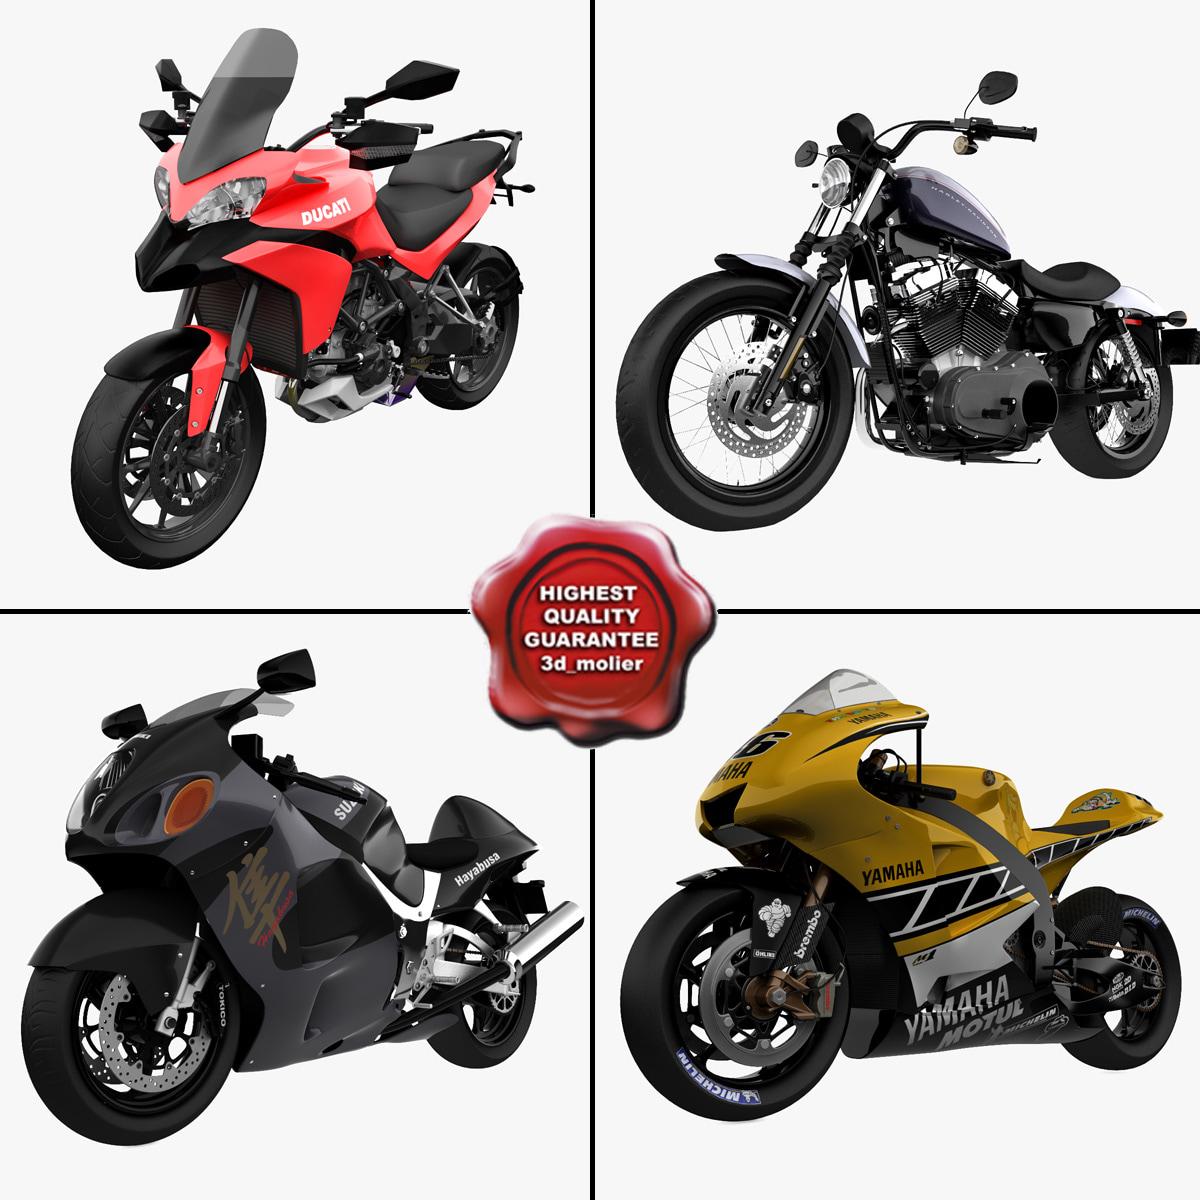 Moto collection 10 copy.jpg